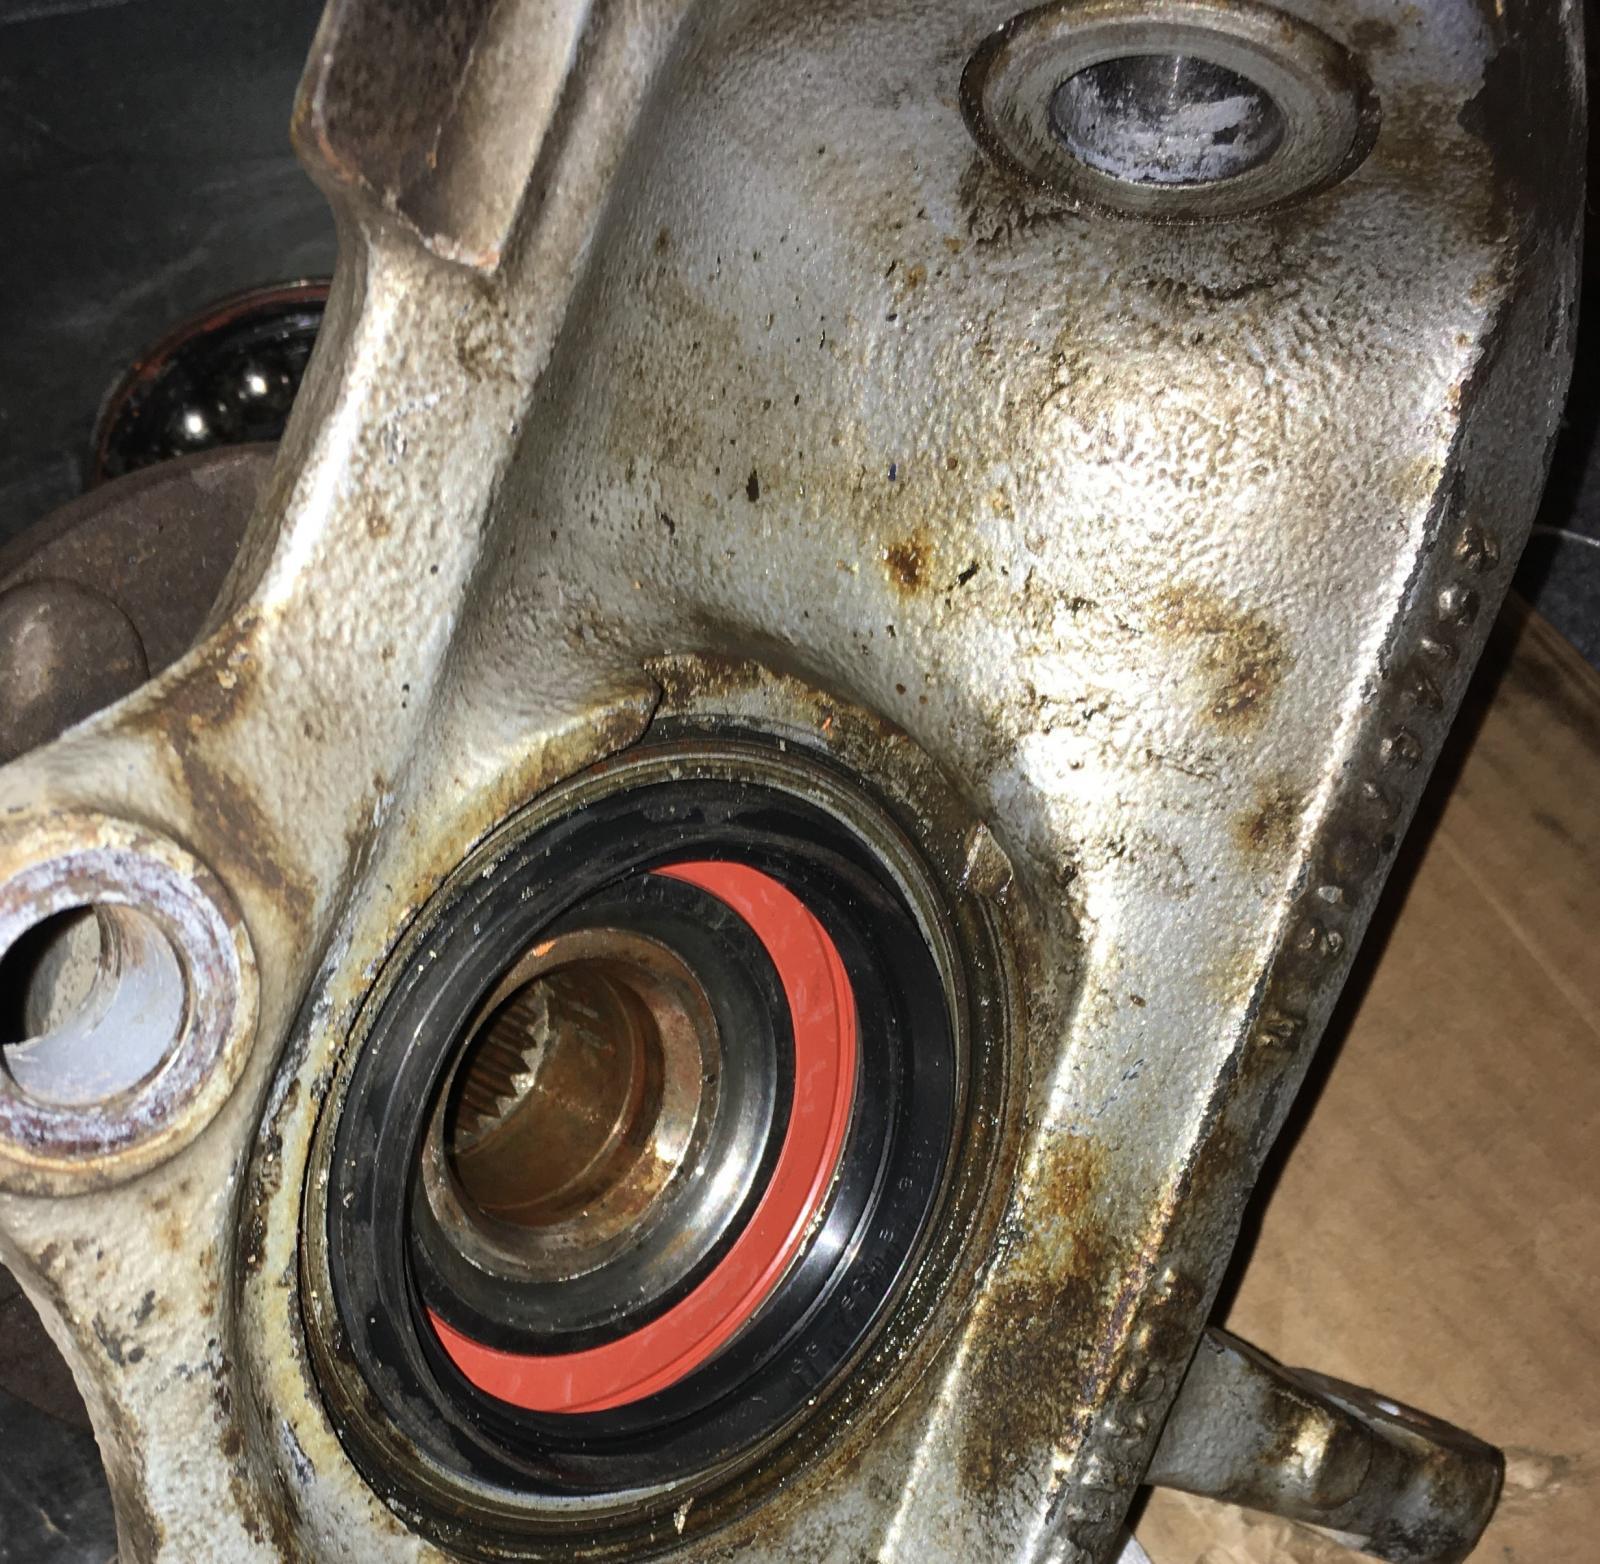 New bearing syncro